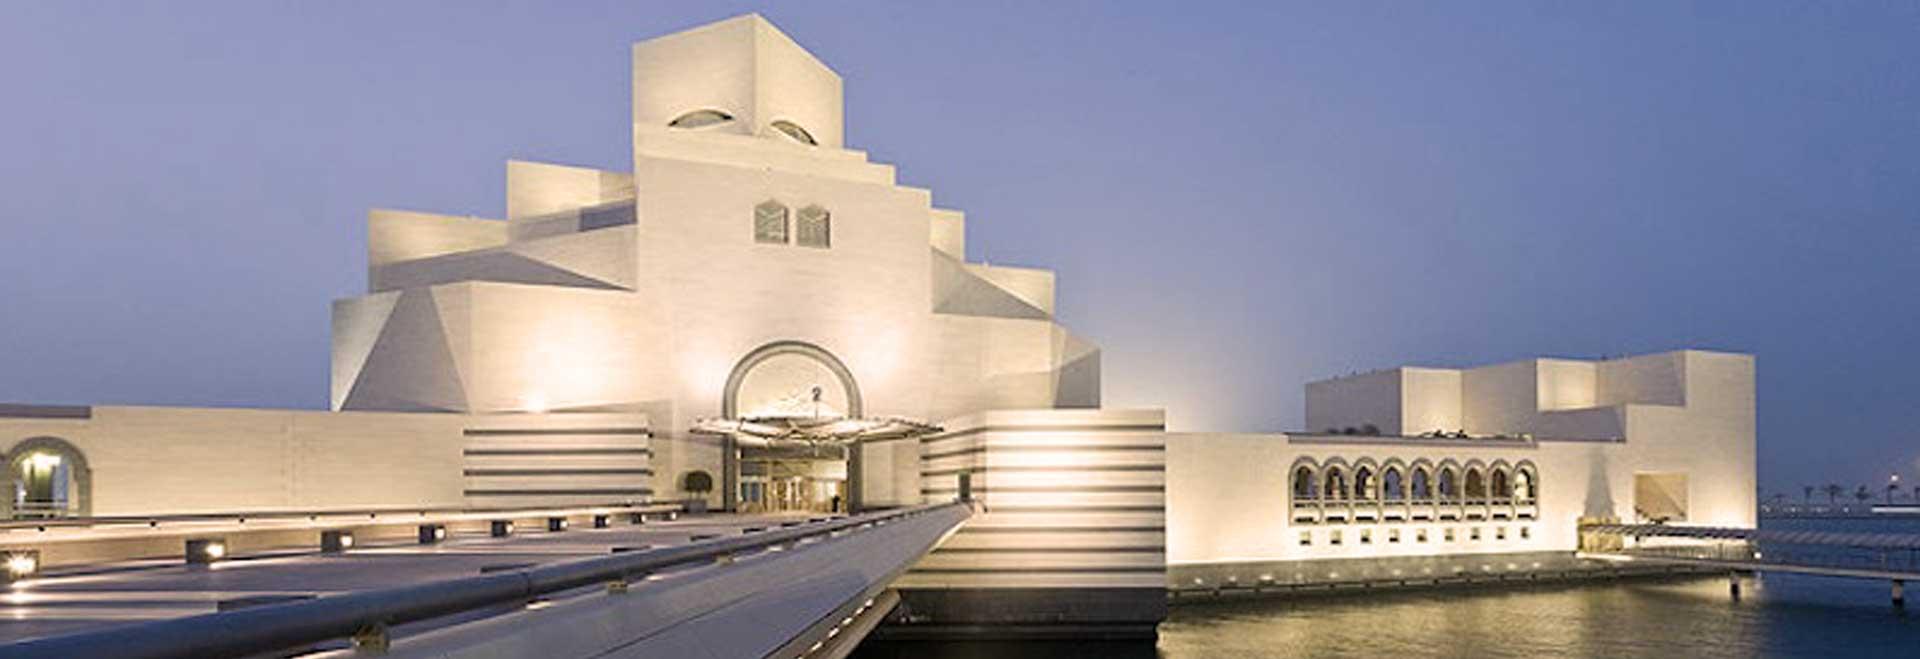 3D2N Qatar Short Break